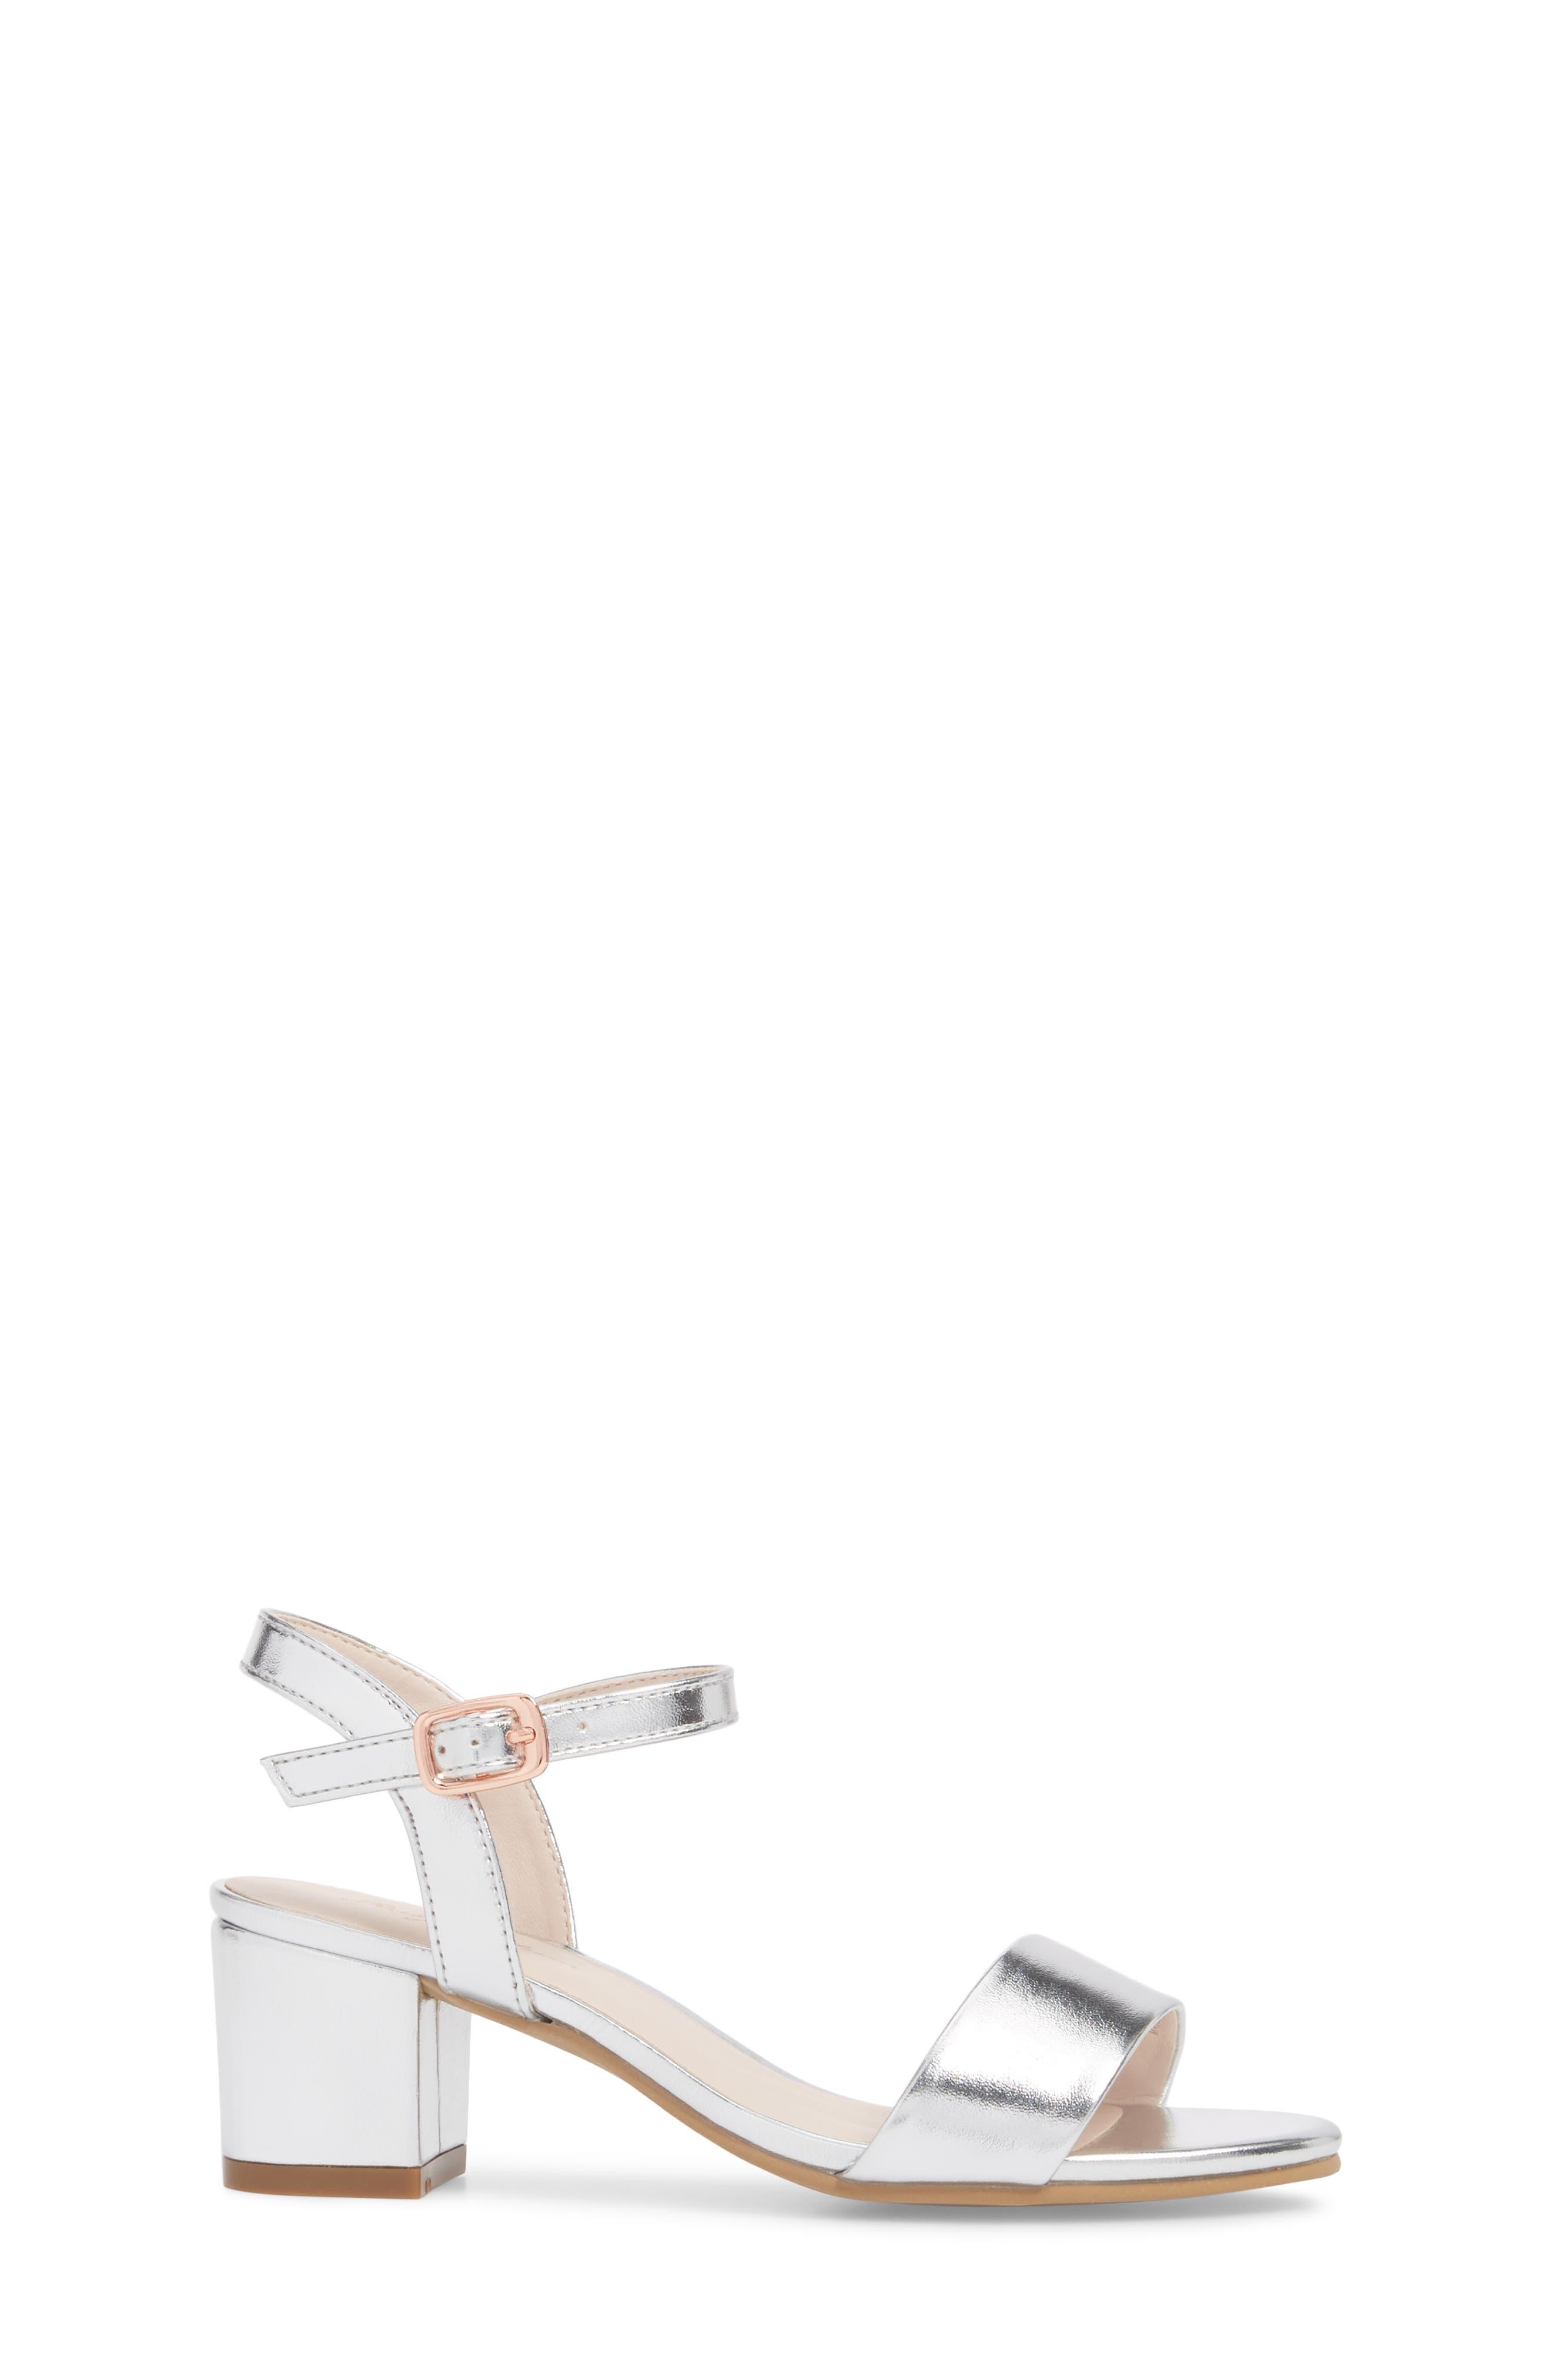 Danni Block Heel Sandal,                             Alternate thumbnail 3, color,                             Silver Faux Leather